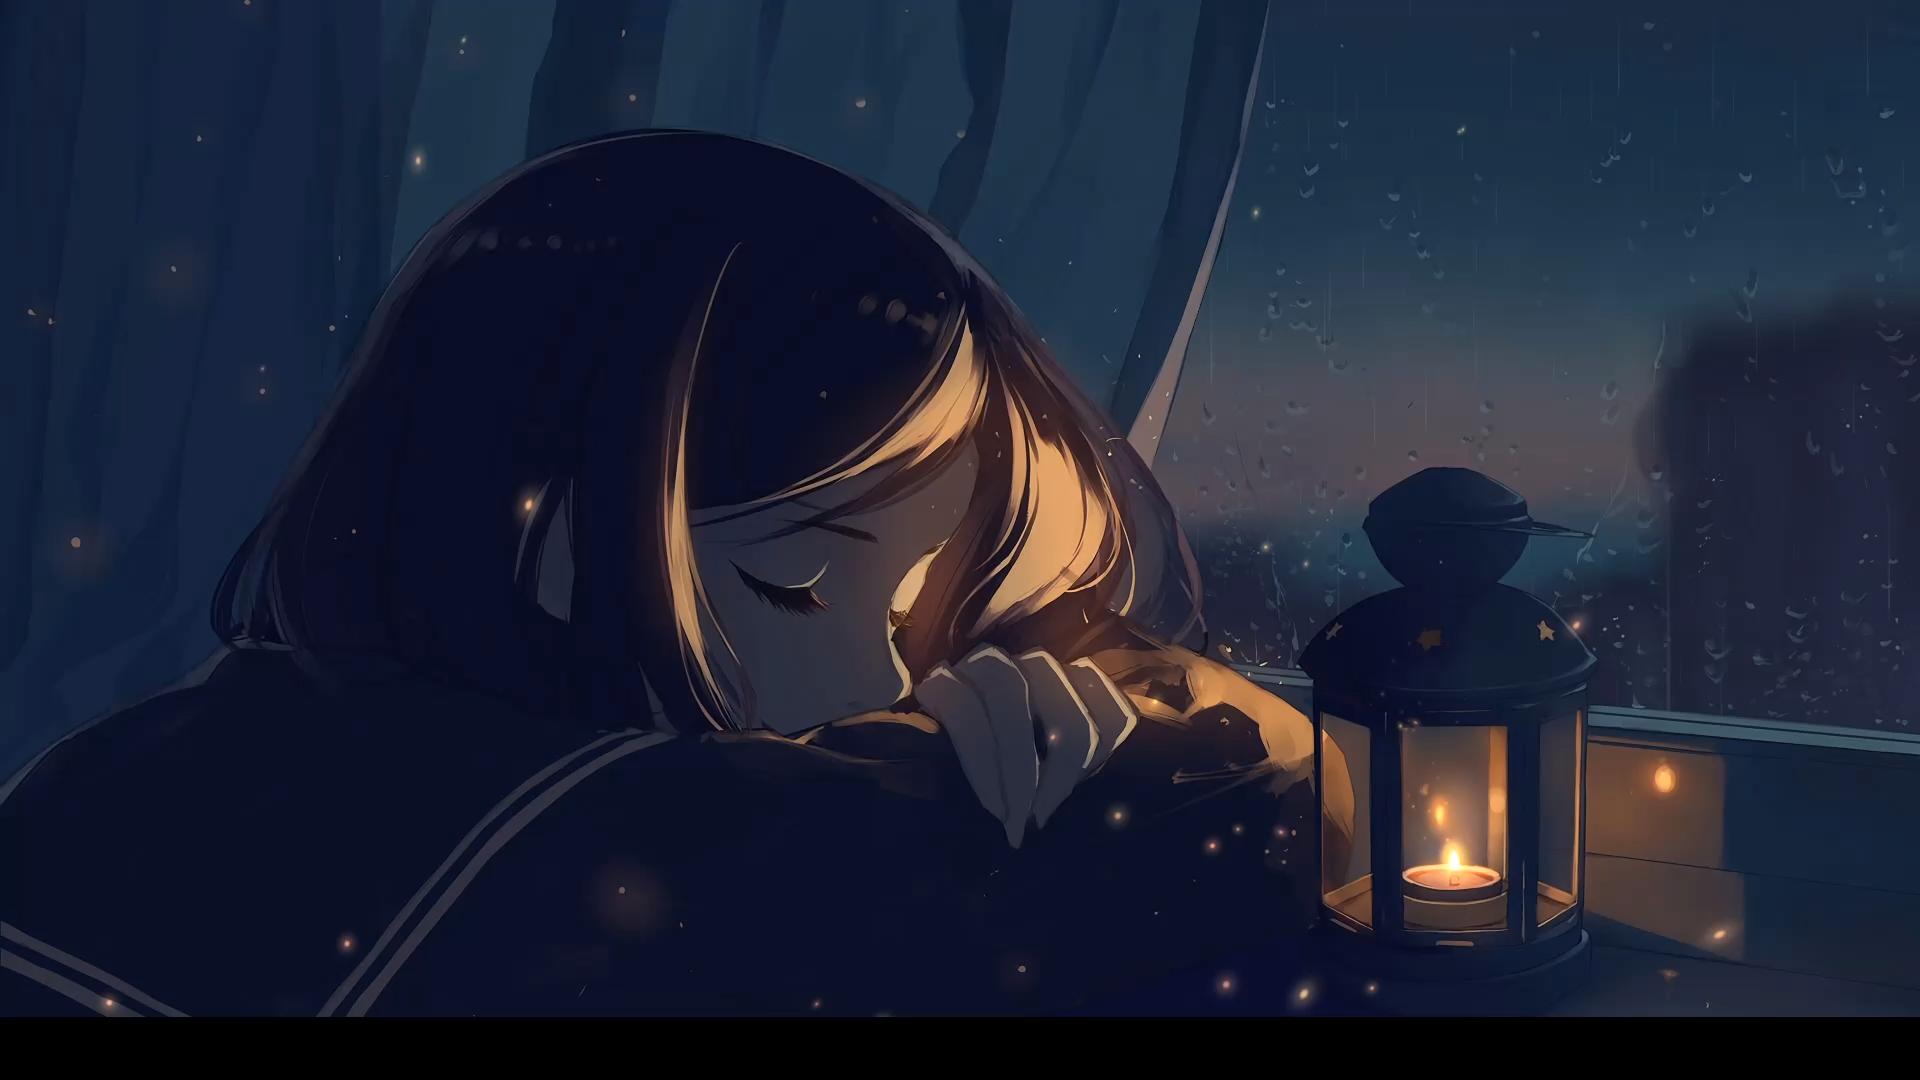 Wallpaper Video Video Anime Scenery Anime Art Beautiful Anime Scenery Wallpaper